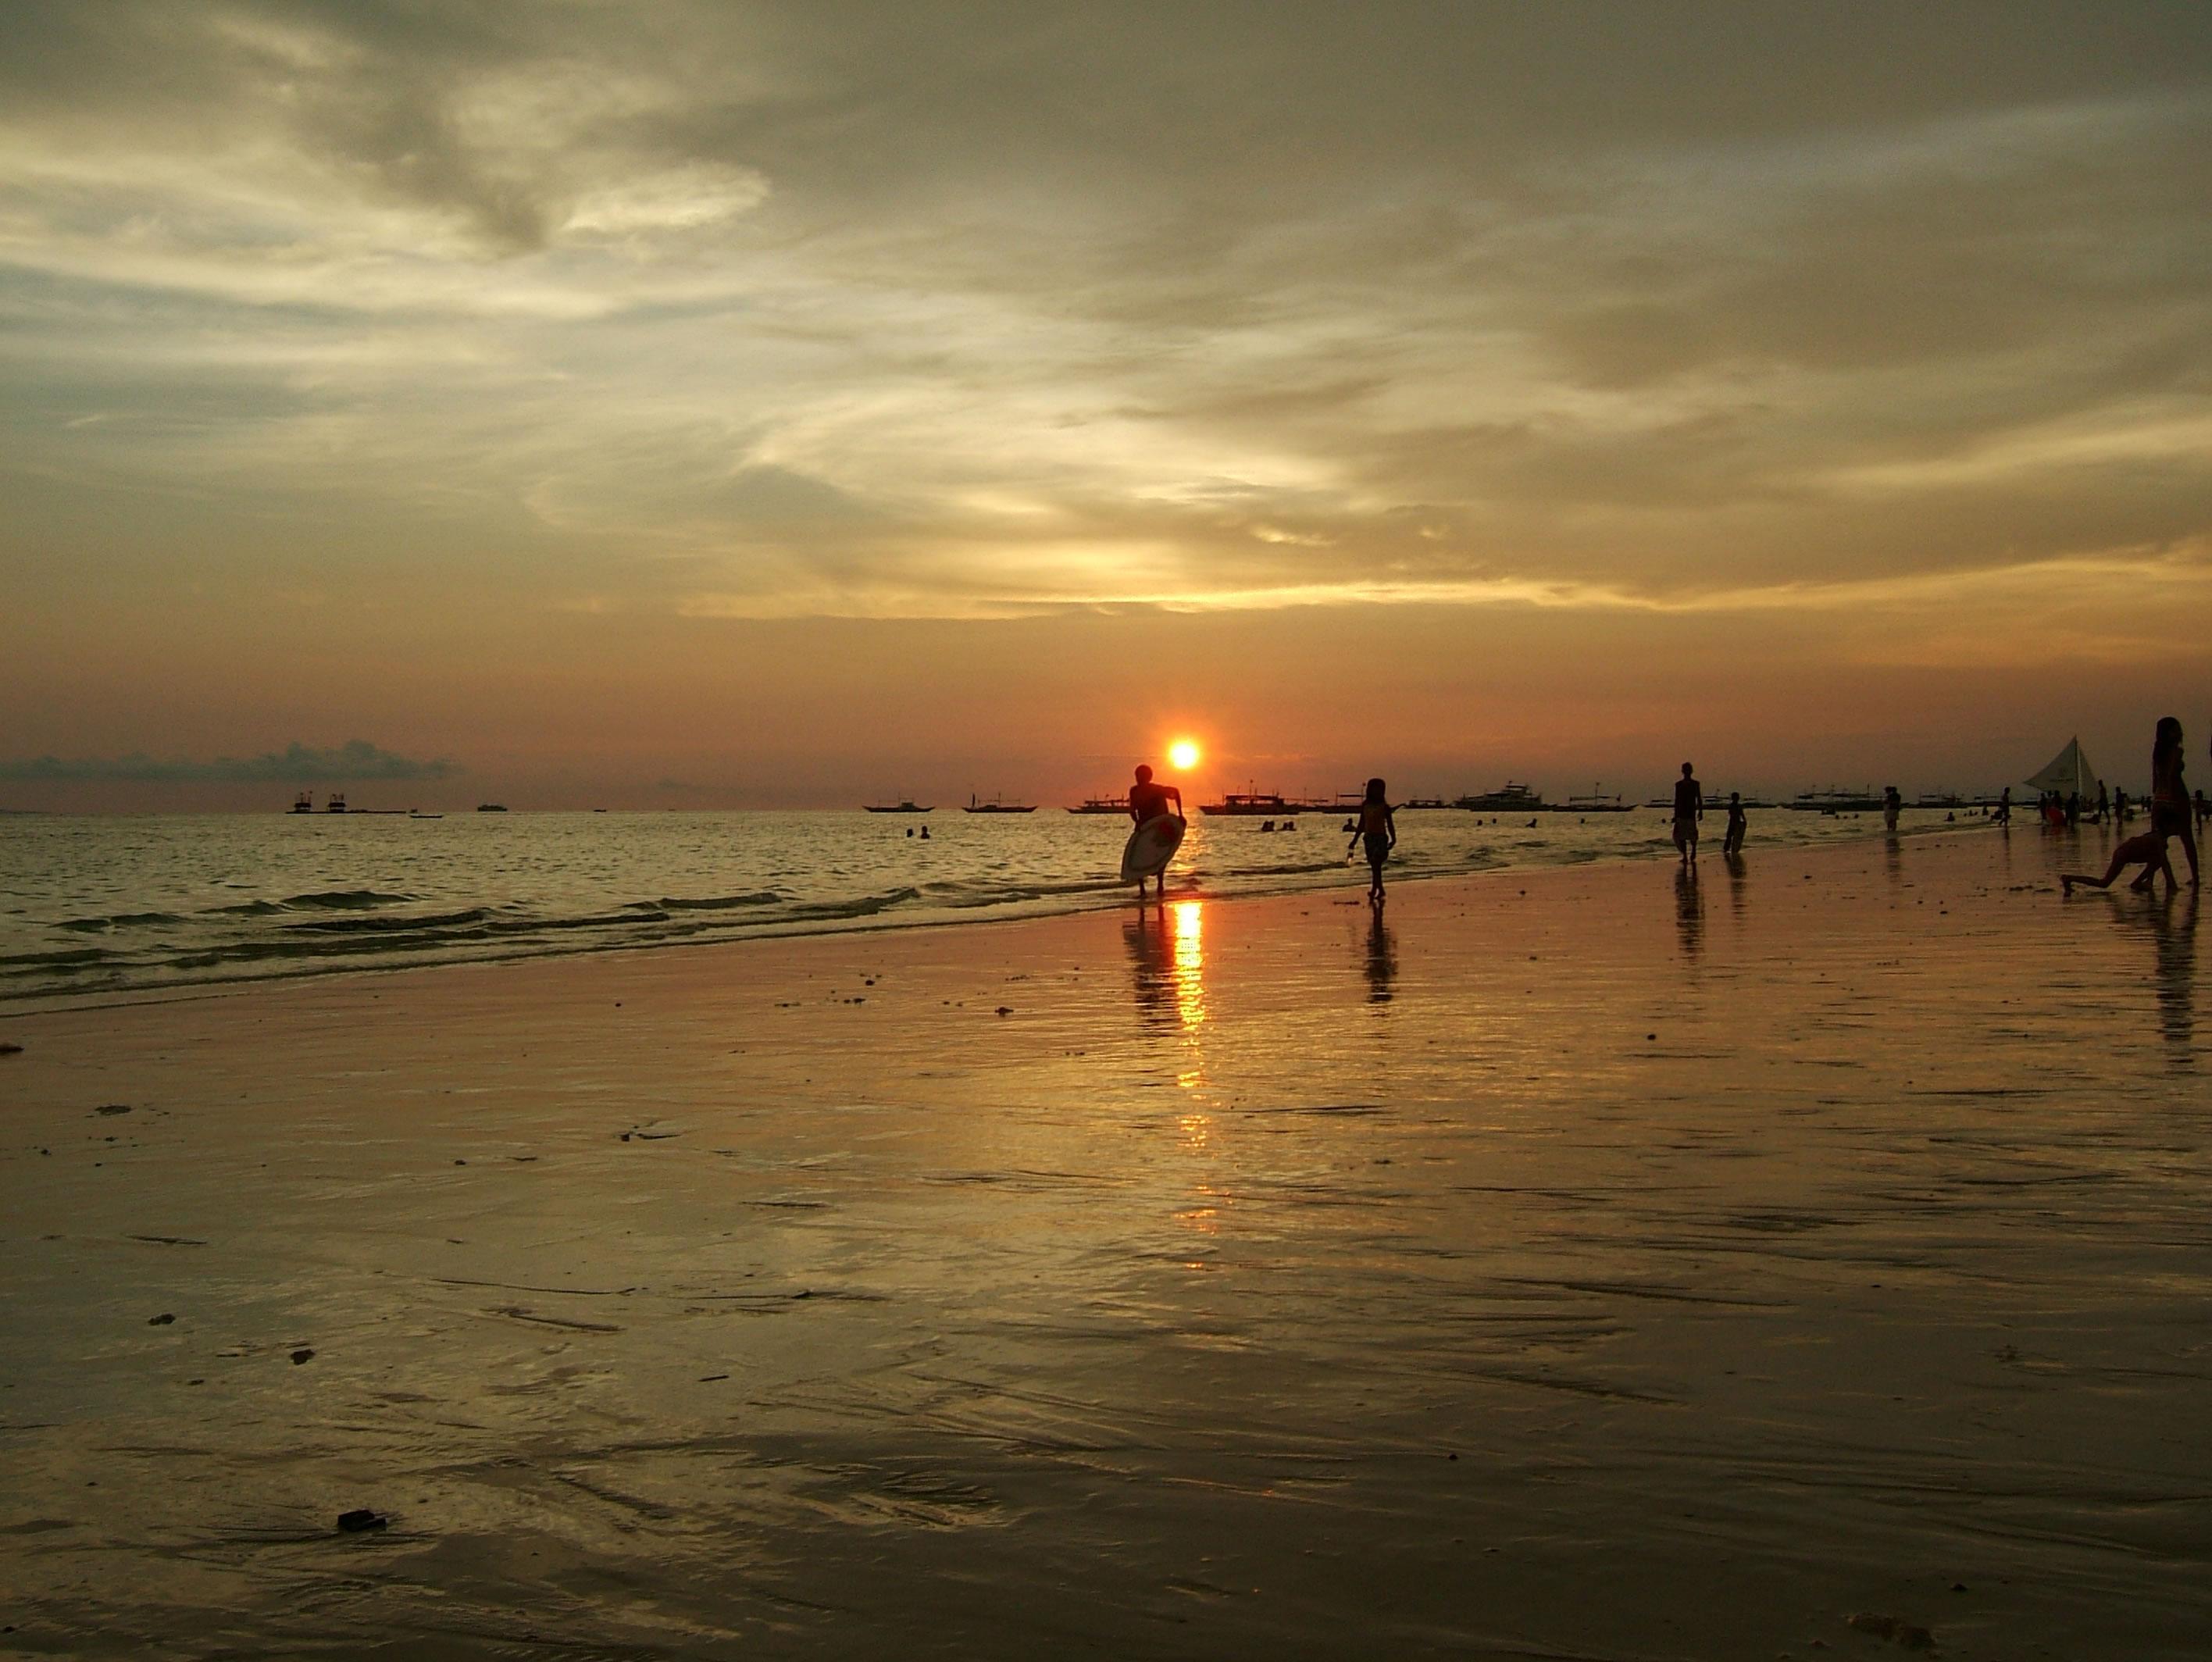 Philippines Sugar Islands Caticlan Boracay White Beach Sunset 2007 20